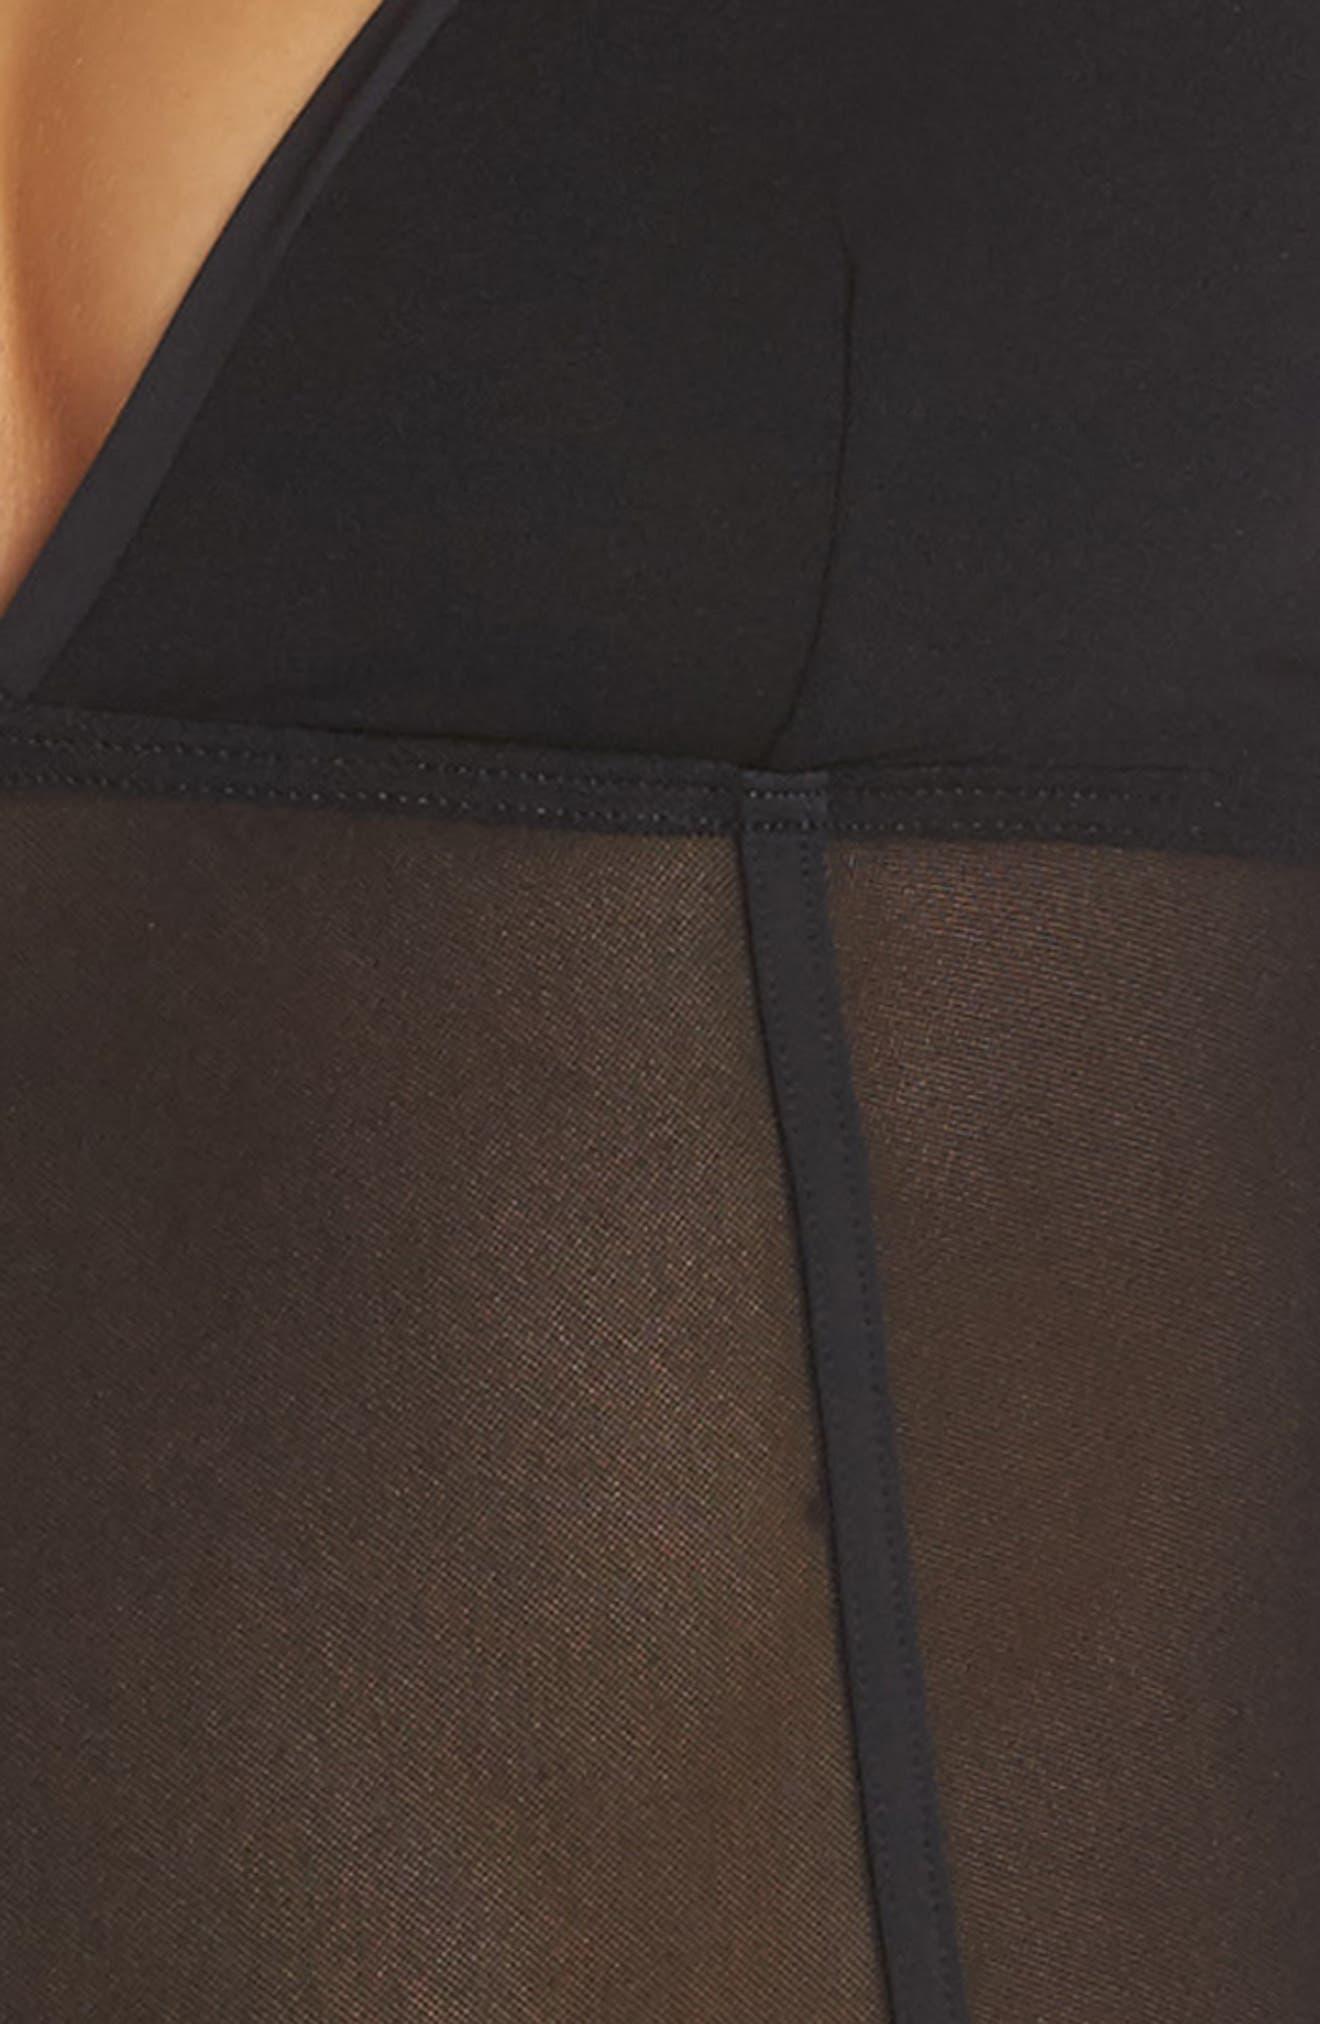 Verona Bodysuit,                             Alternate thumbnail 5, color,                             001